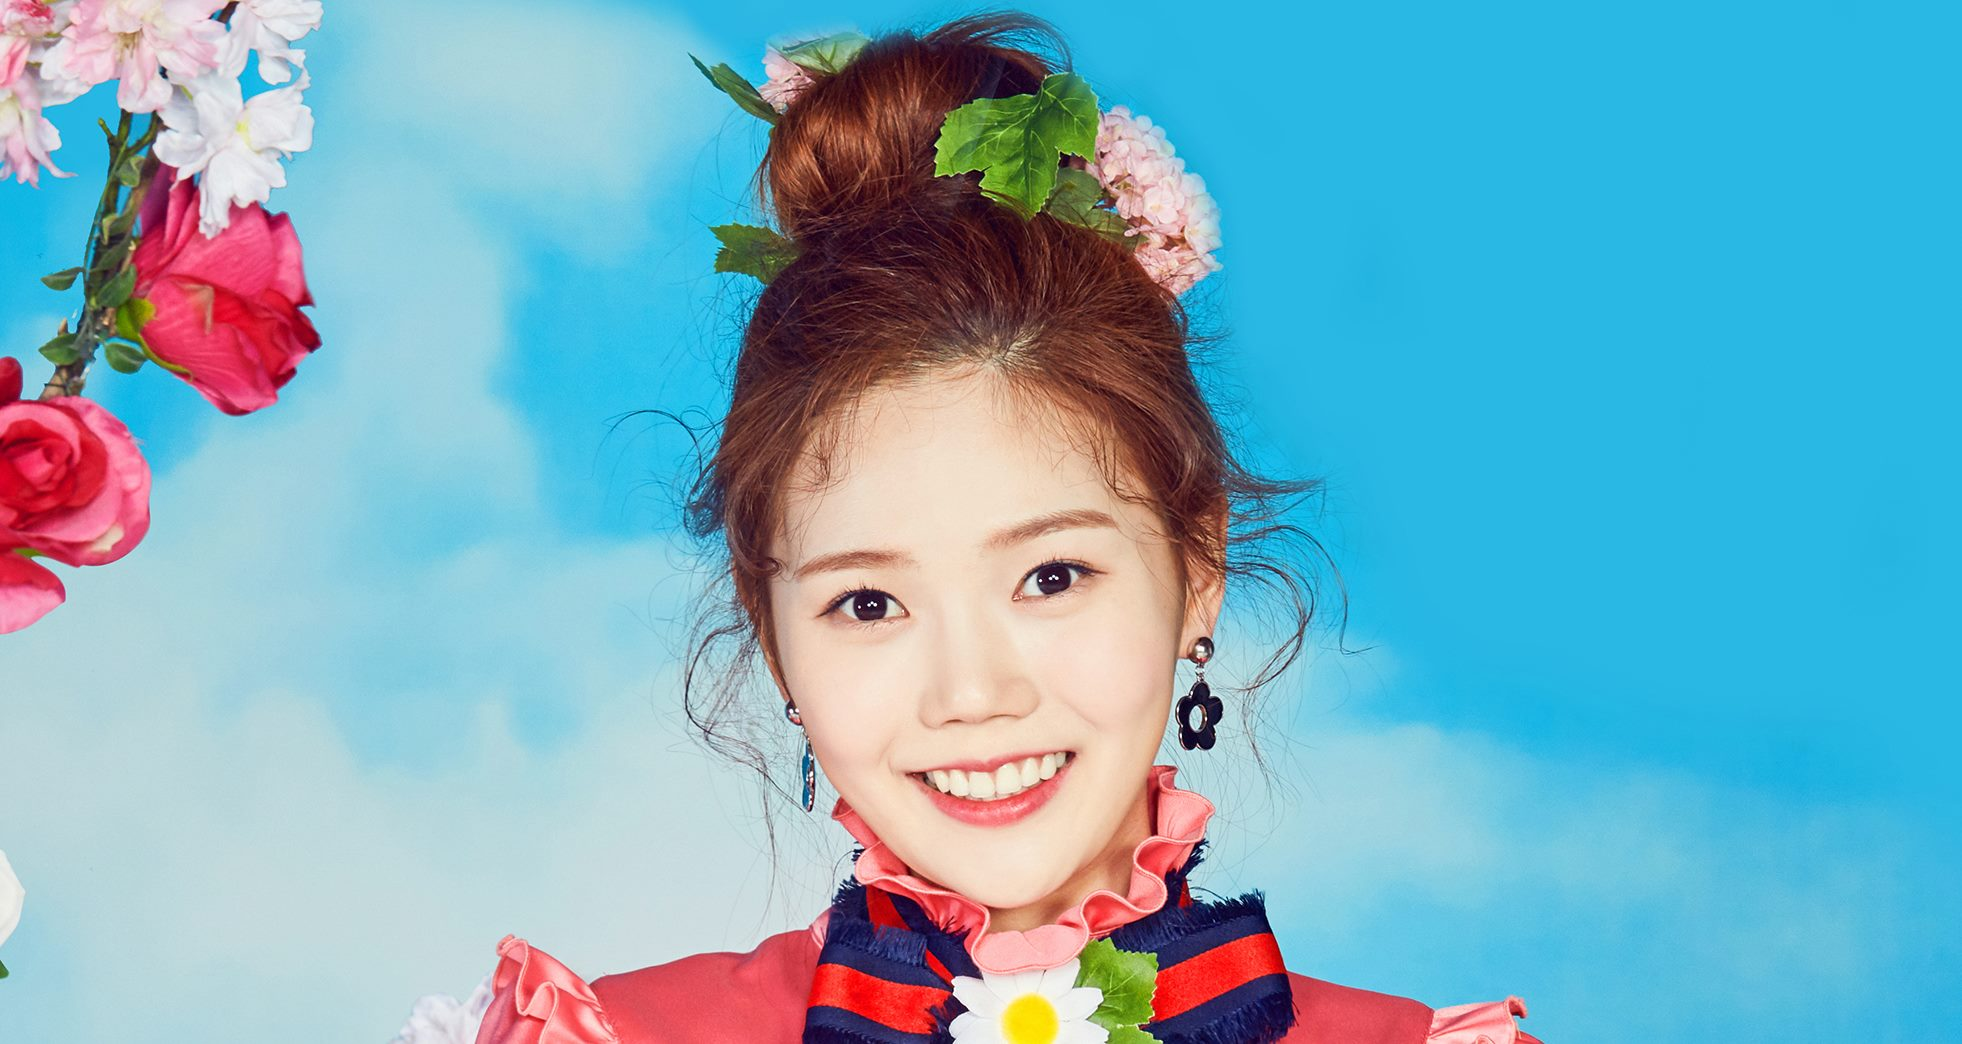 Oh My Girl Hyojung Profile